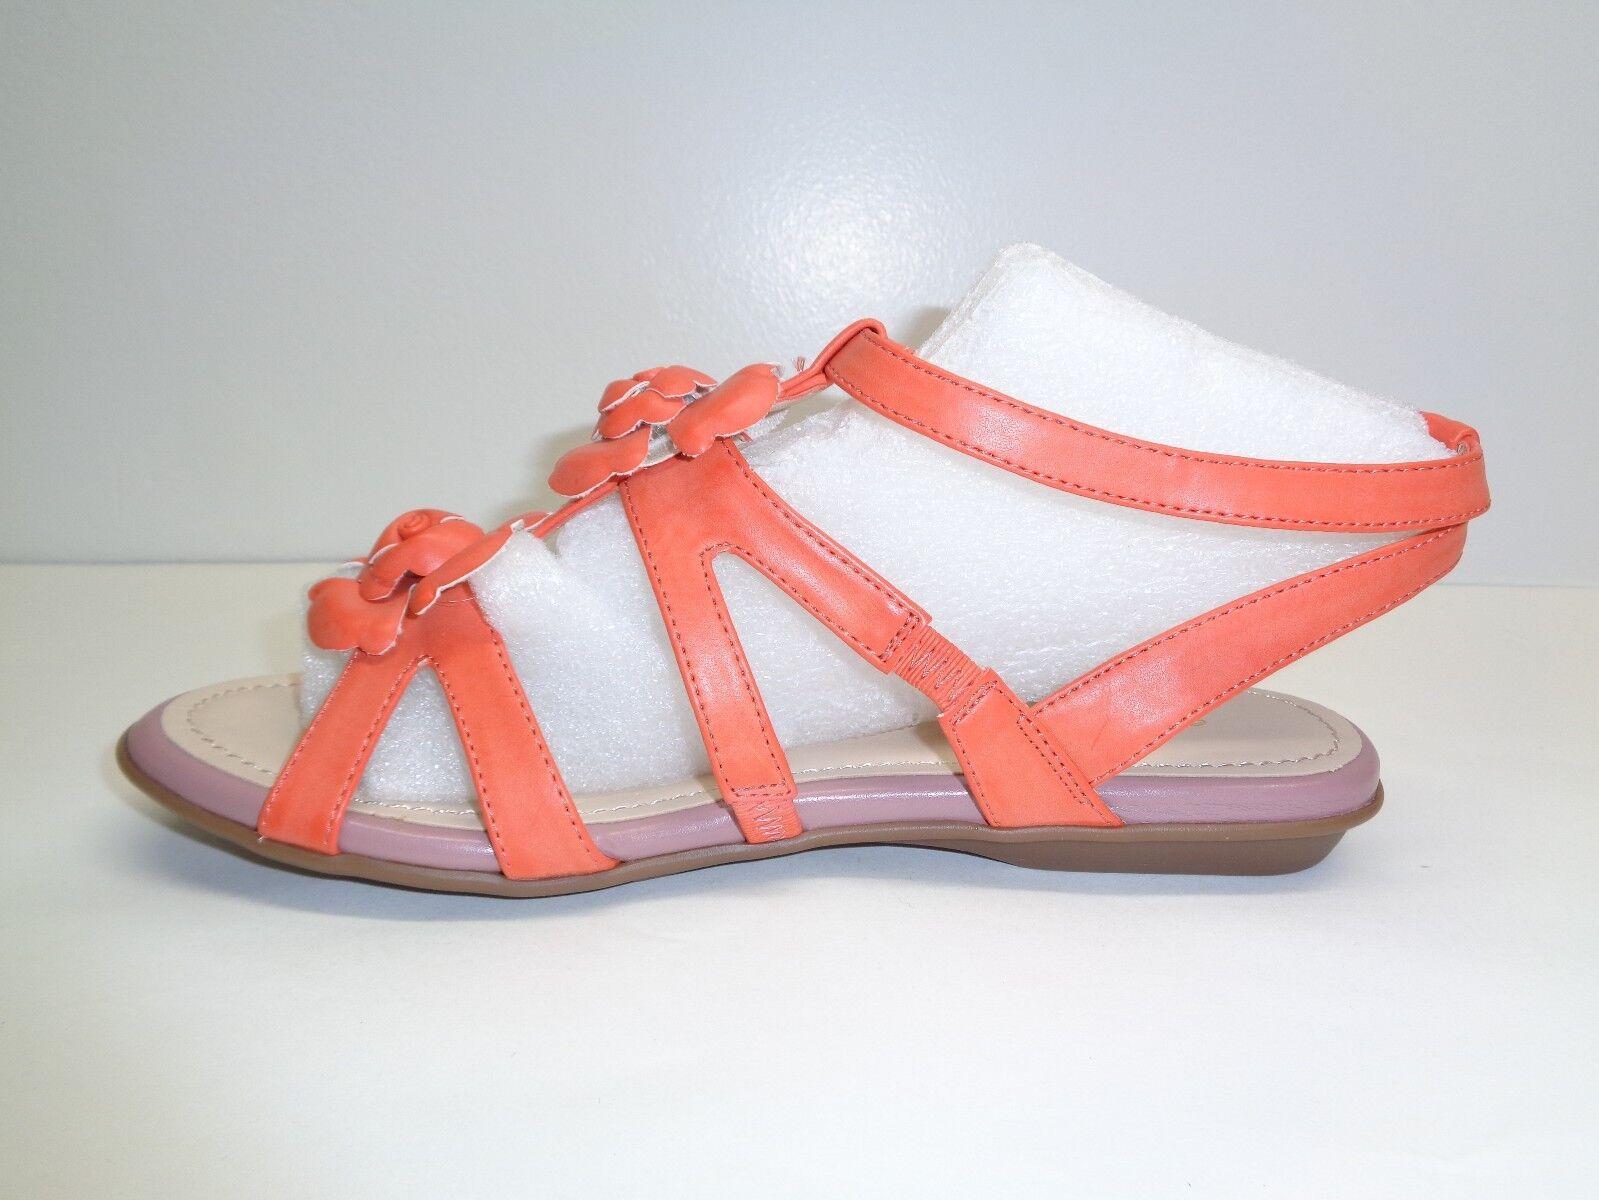 Easy Spirit Dimensione 6 W WIDE RAVINDRA RAVINDRA RAVINDRA Coral arancia Floral Sandals New donna scarpe a49c8c